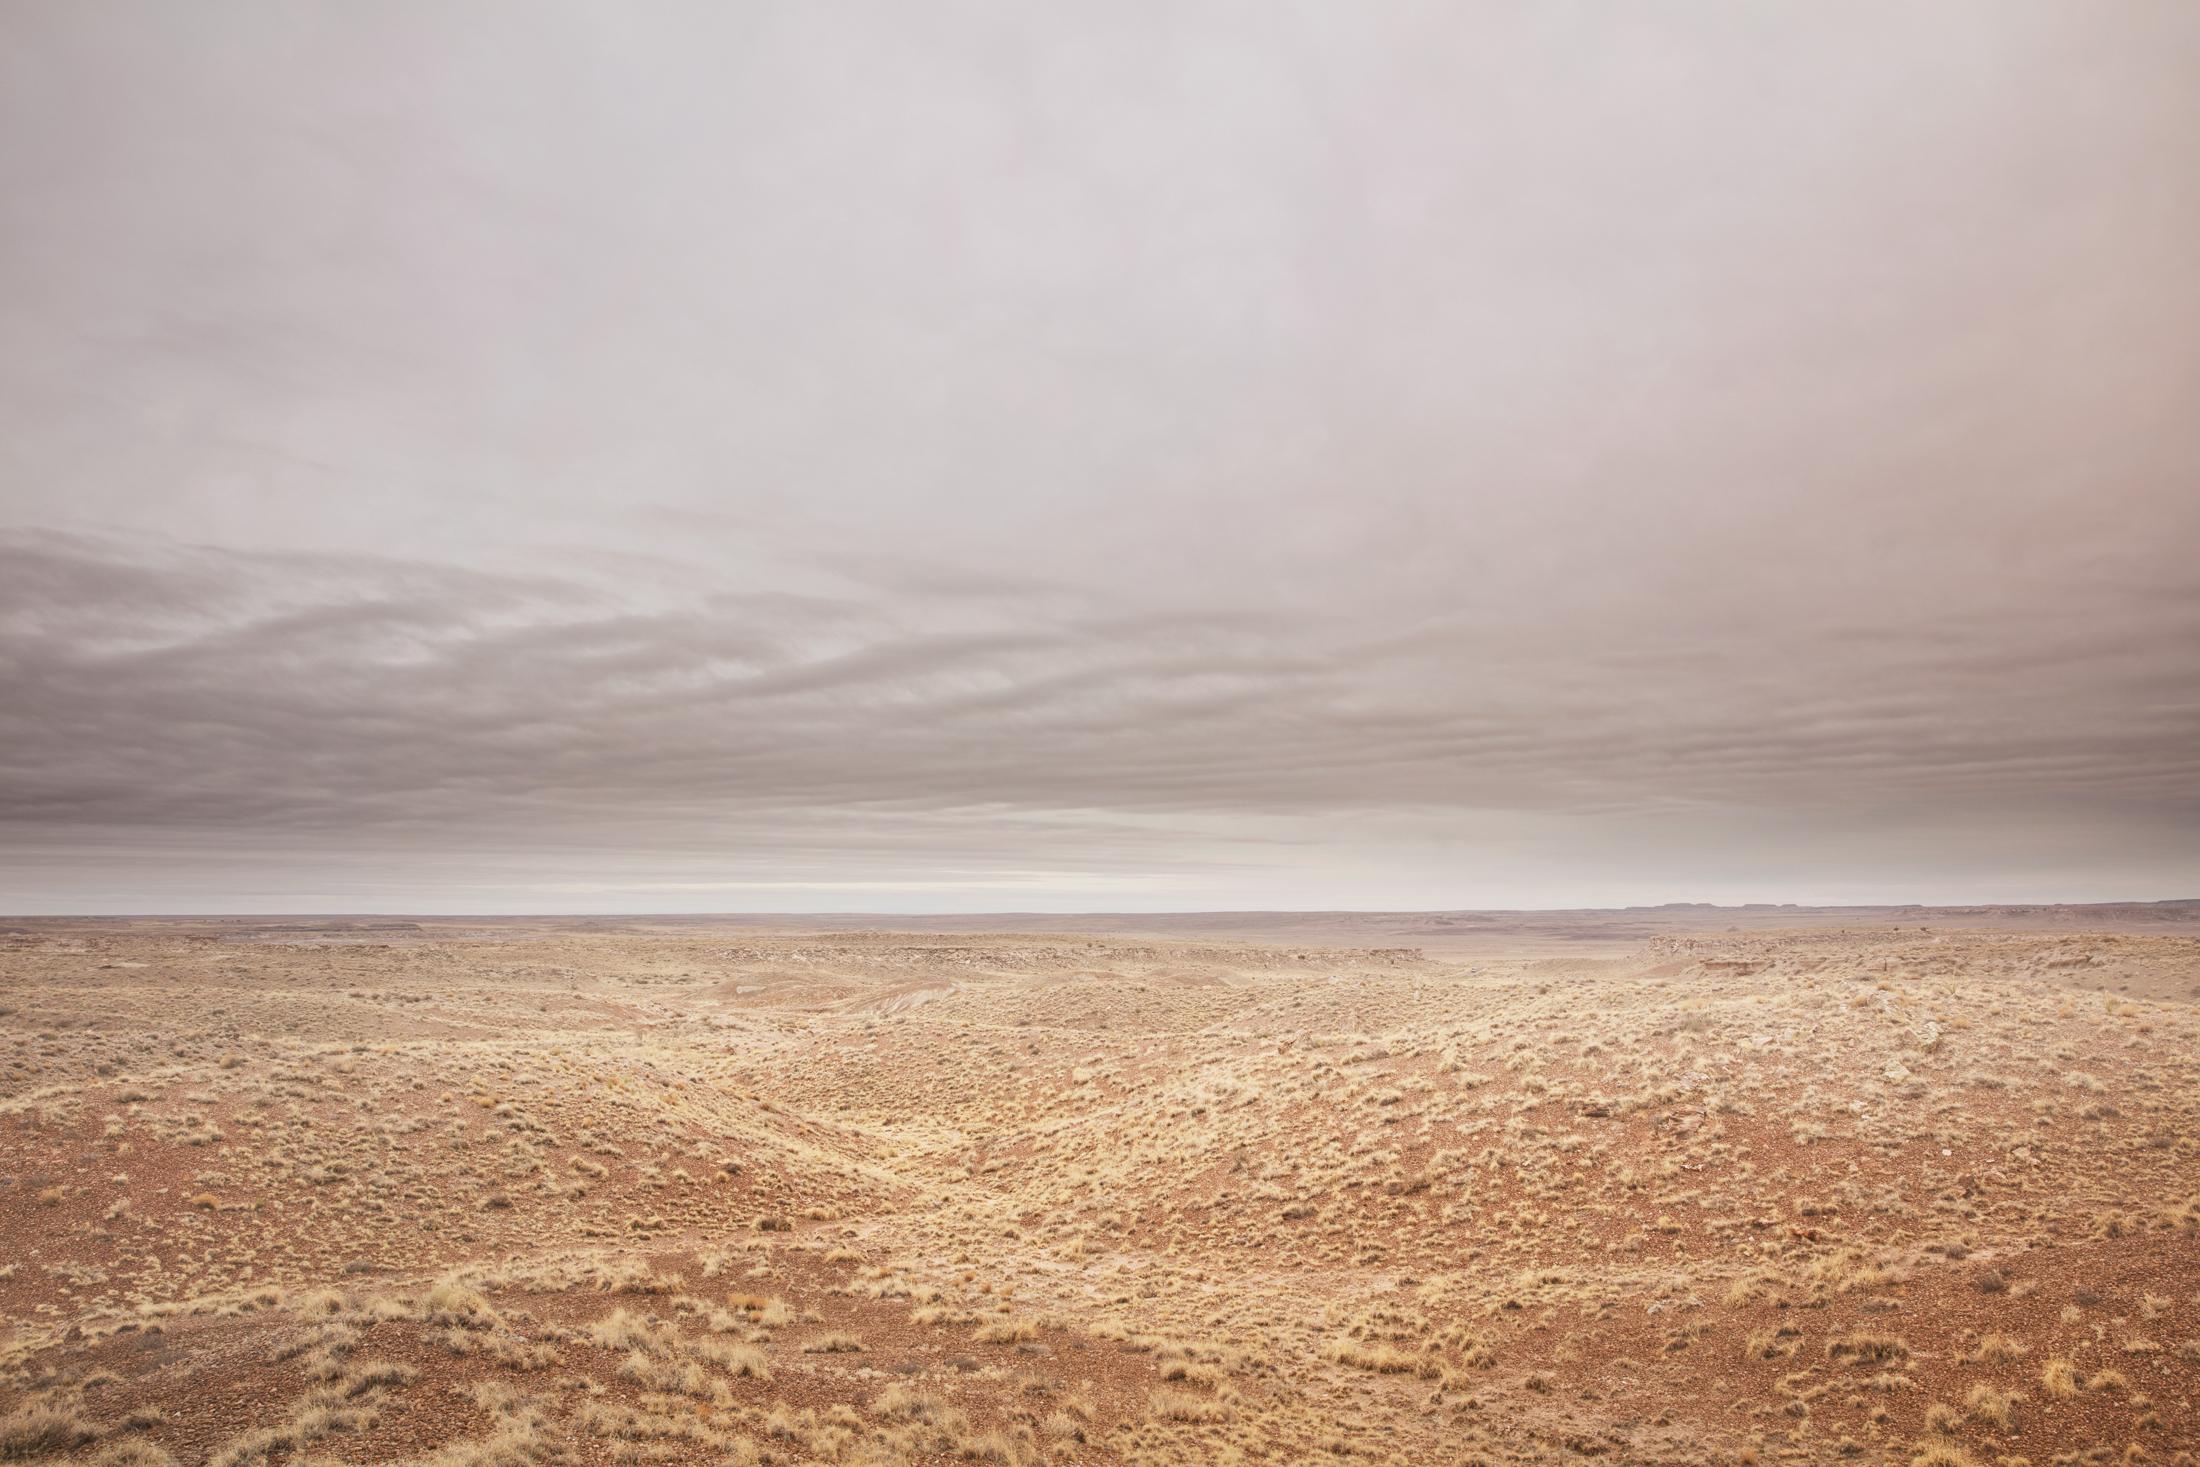 5) Infinity Series #4279, Arizona. Photograph, 32X48 inches, 2017.